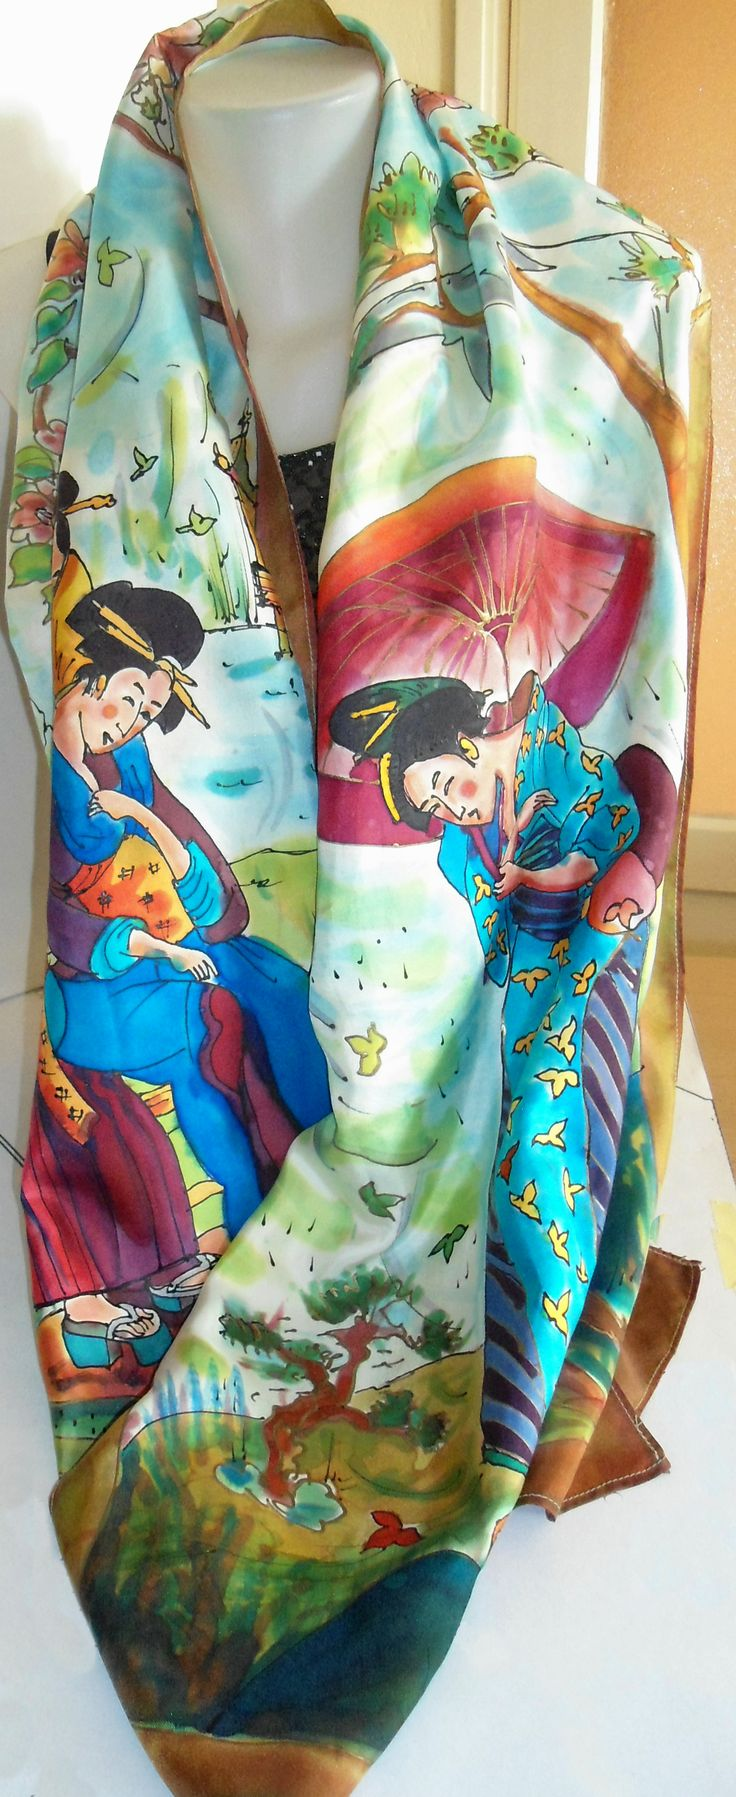 Chal de seda pintado a mano con personajes de Kitagawa Utamaro.